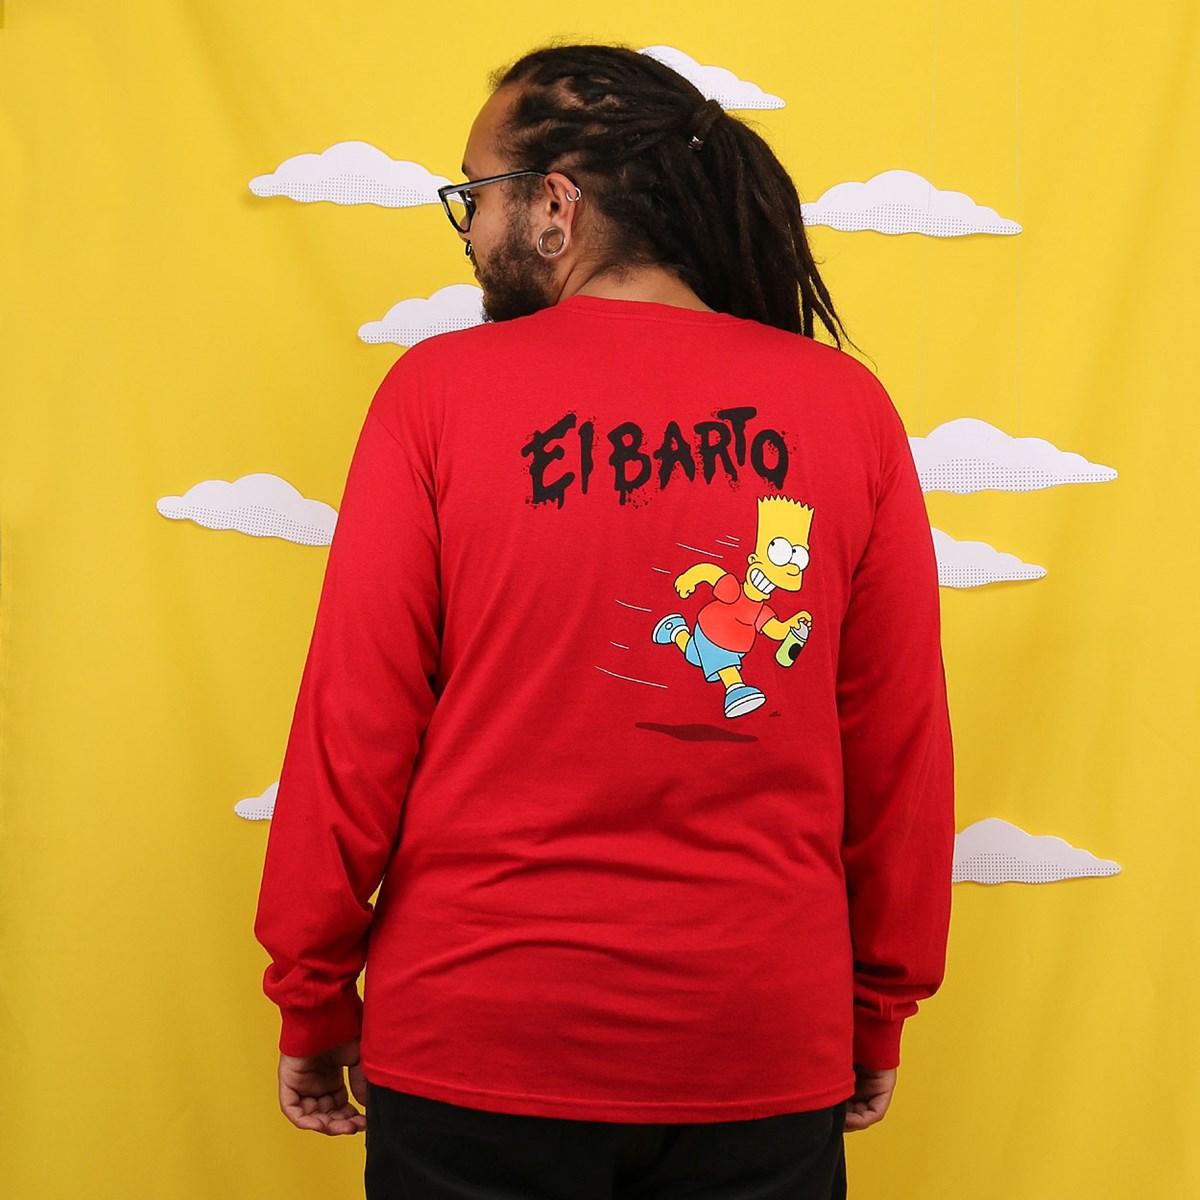 Camiseta Vans The Simpsons El Barto Manga Longa Red VN0A4RTN17A